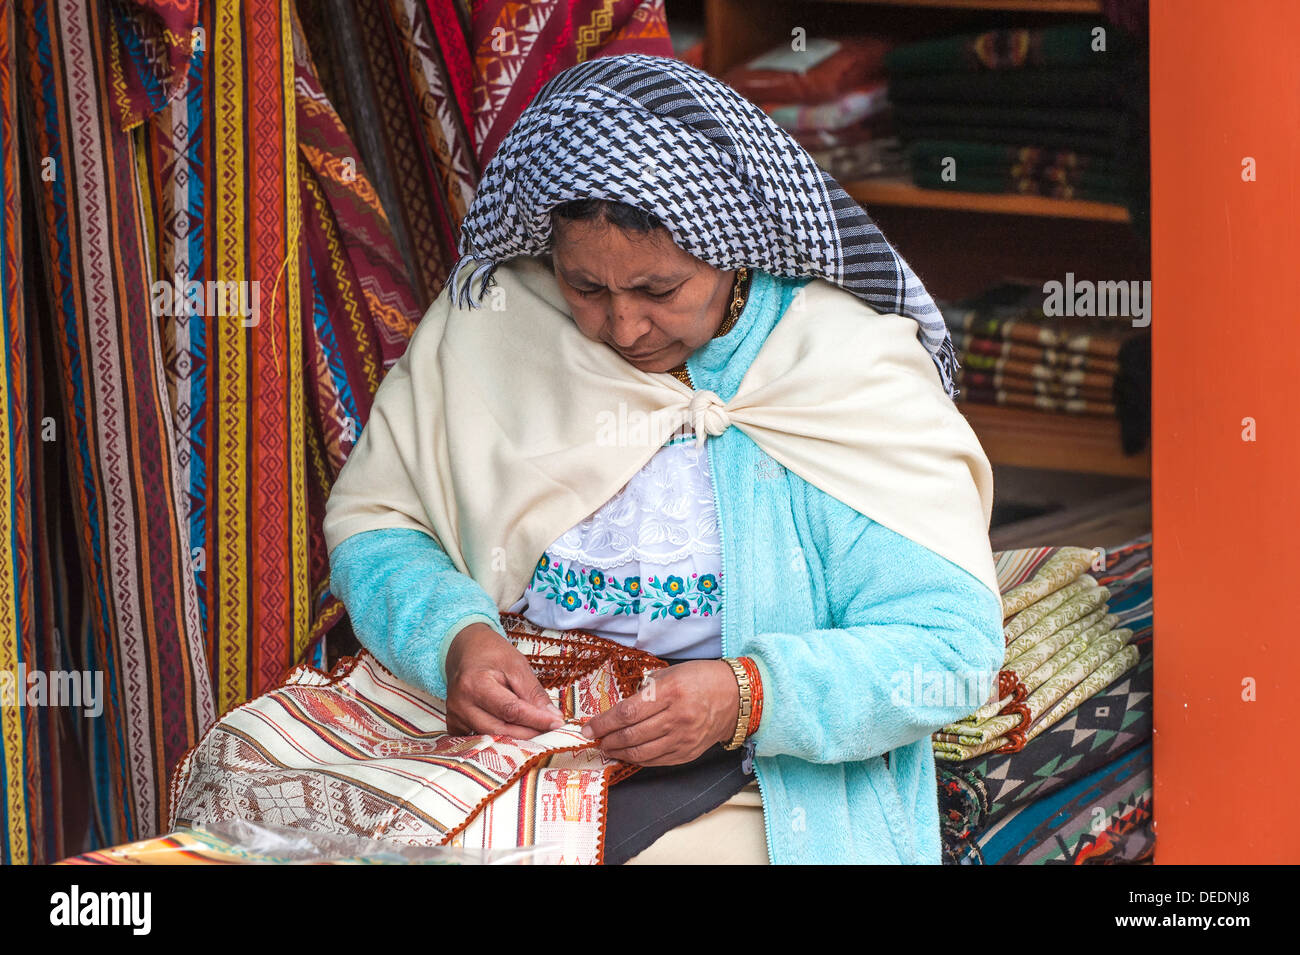 Woman embroidering, Otavalo market, Imbabura Province, Ecuador, South America - Stock Image